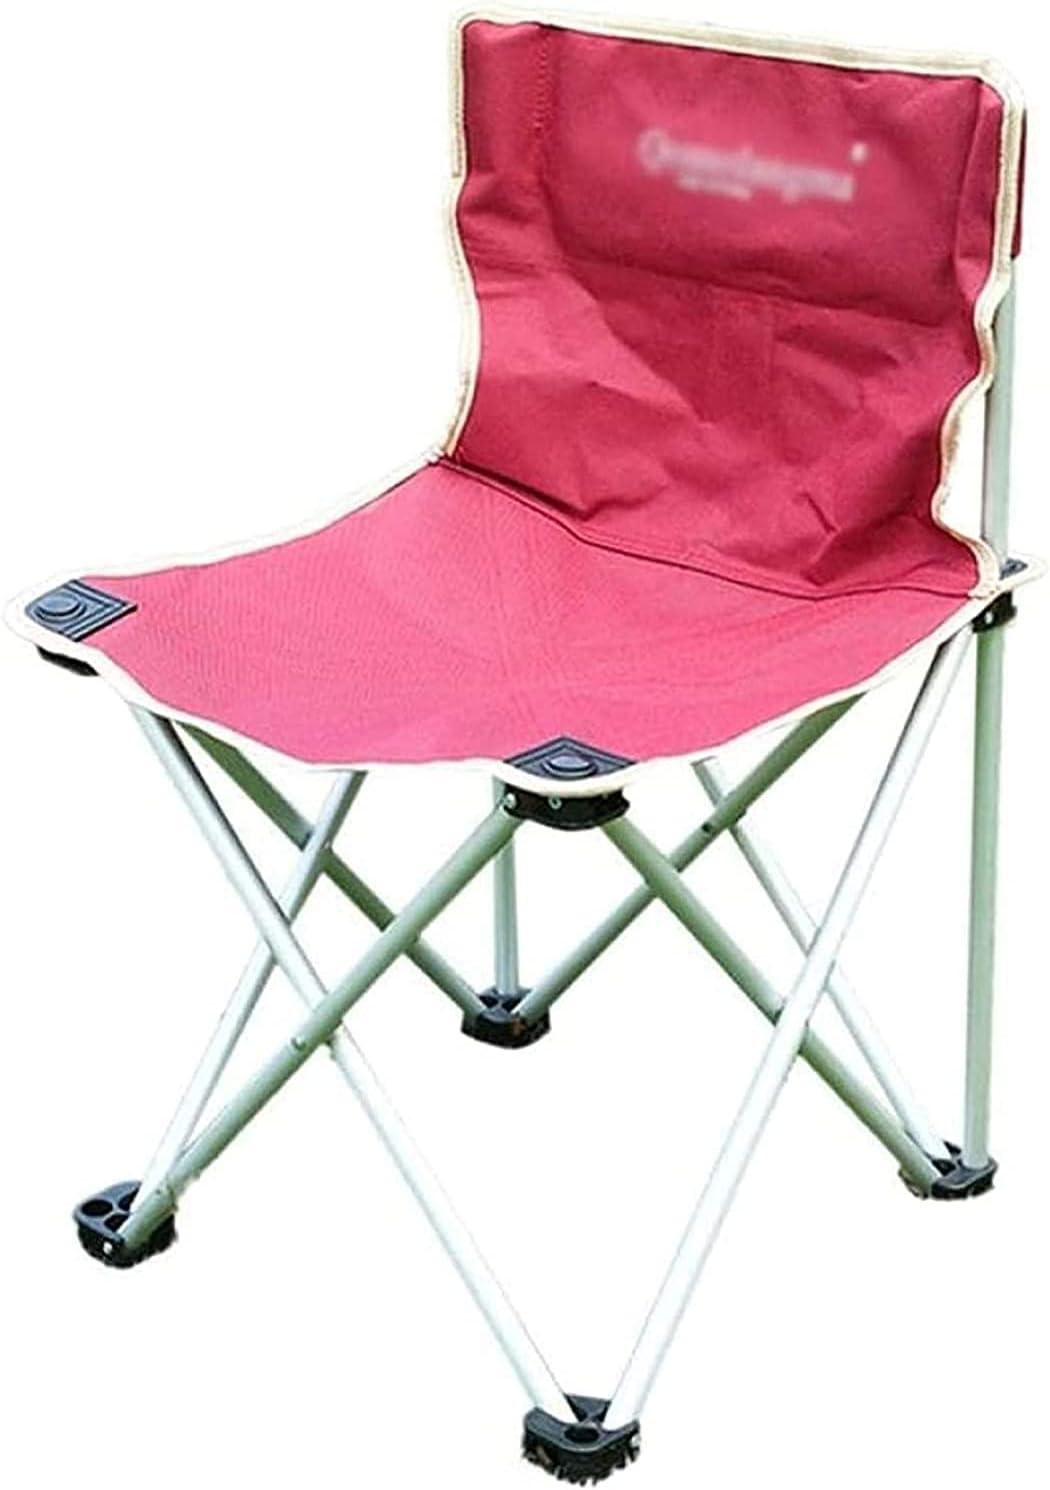 YGCBL Folding Beach Chair Fishing Chair Camping Chair Garden Cha